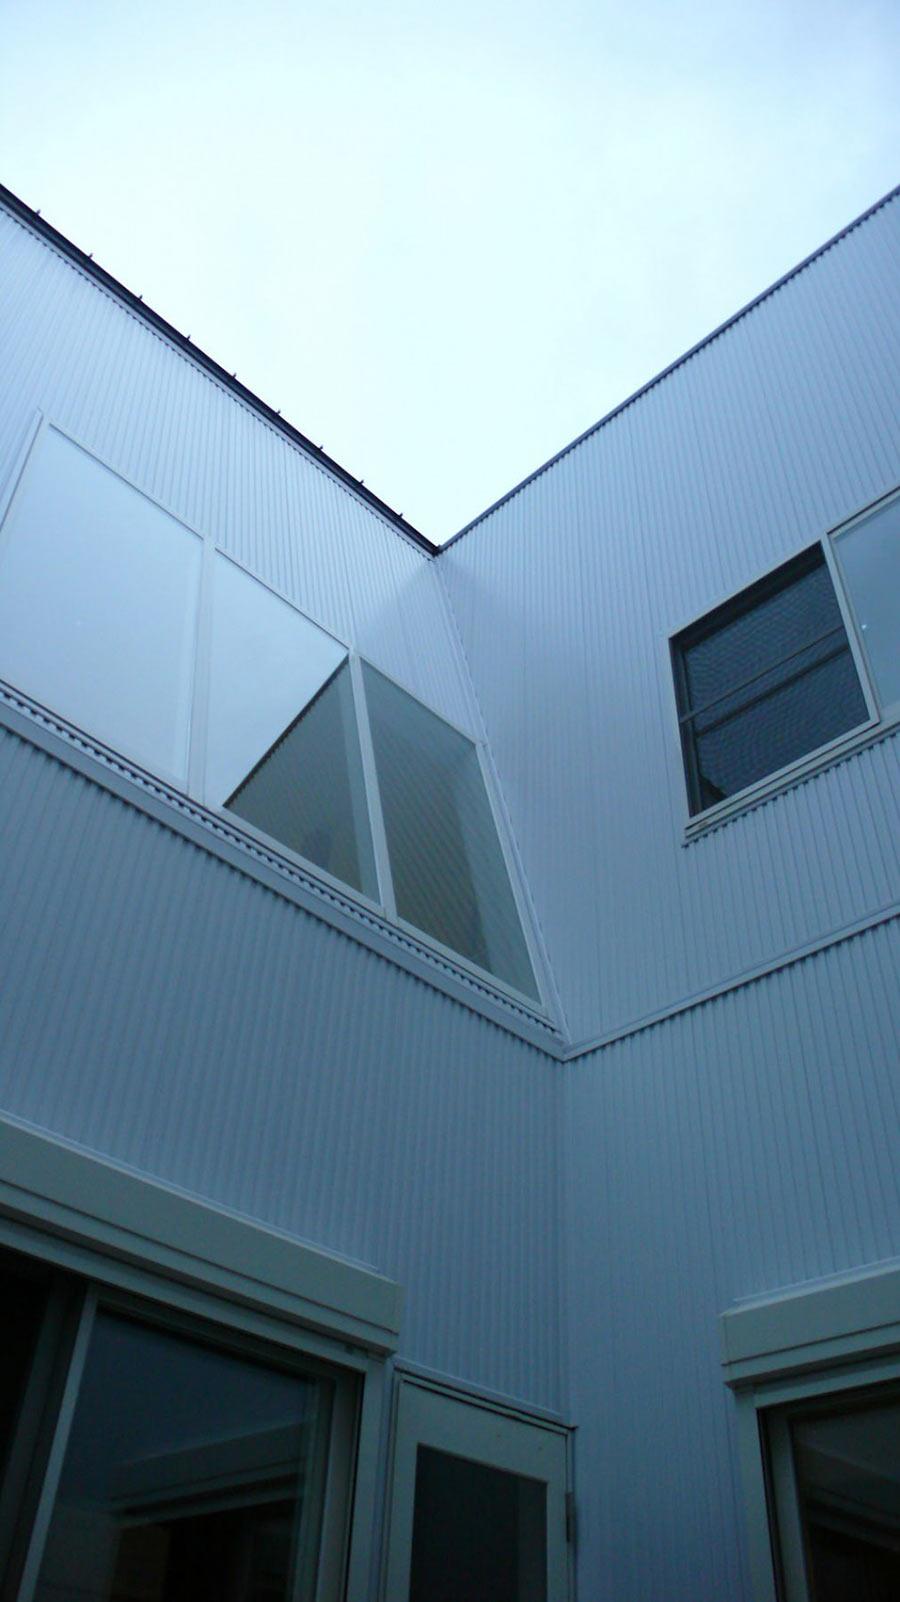 Courtyard, Hansha Reflection House, Nagoya, Japan